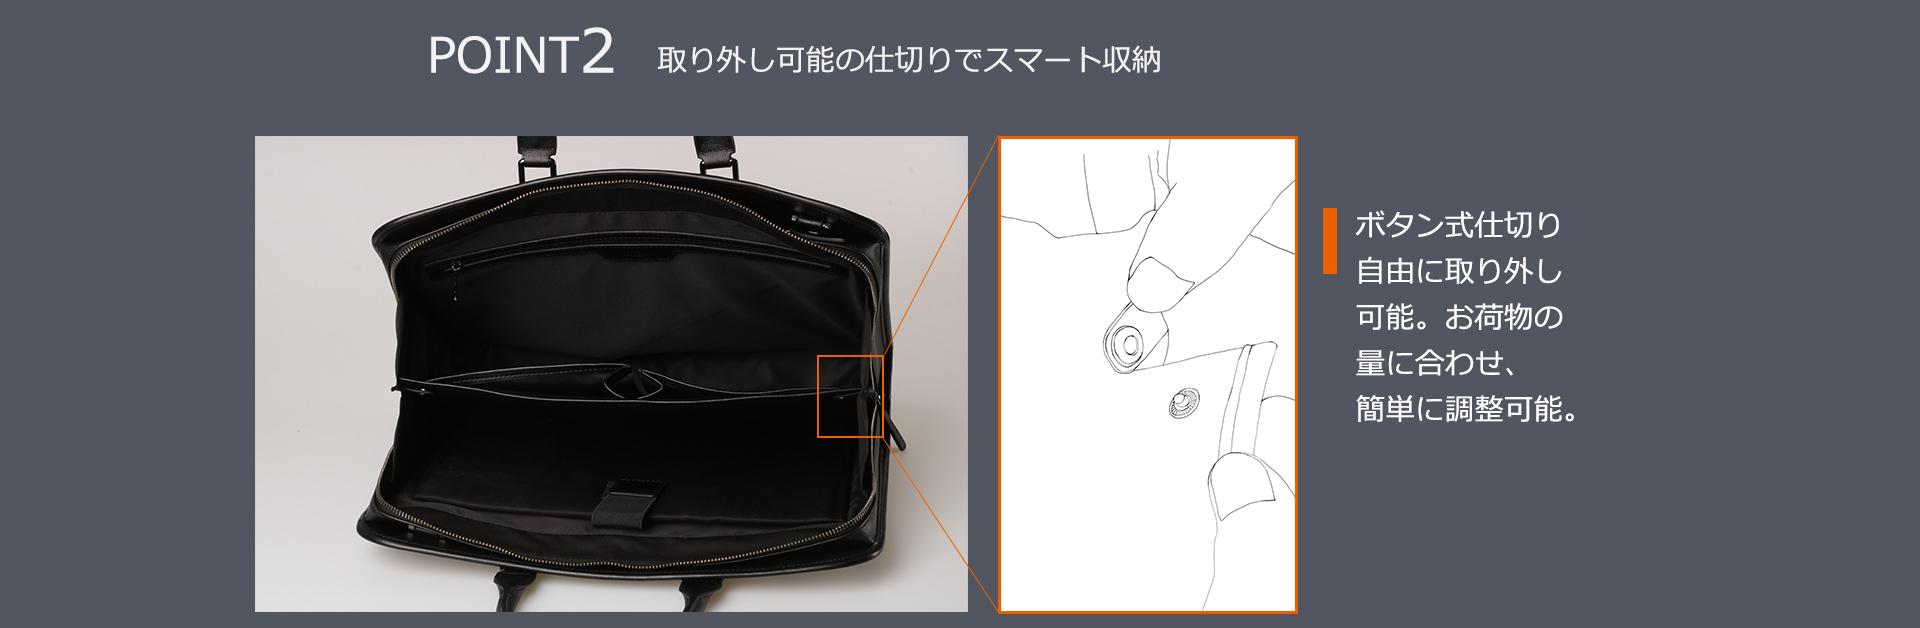 POINT2 取り外し可能の仕切りでスマート収納 ボタン式仕切り自由に取り外し可能。お荷物の量に合わせ、簡単に調整可能。